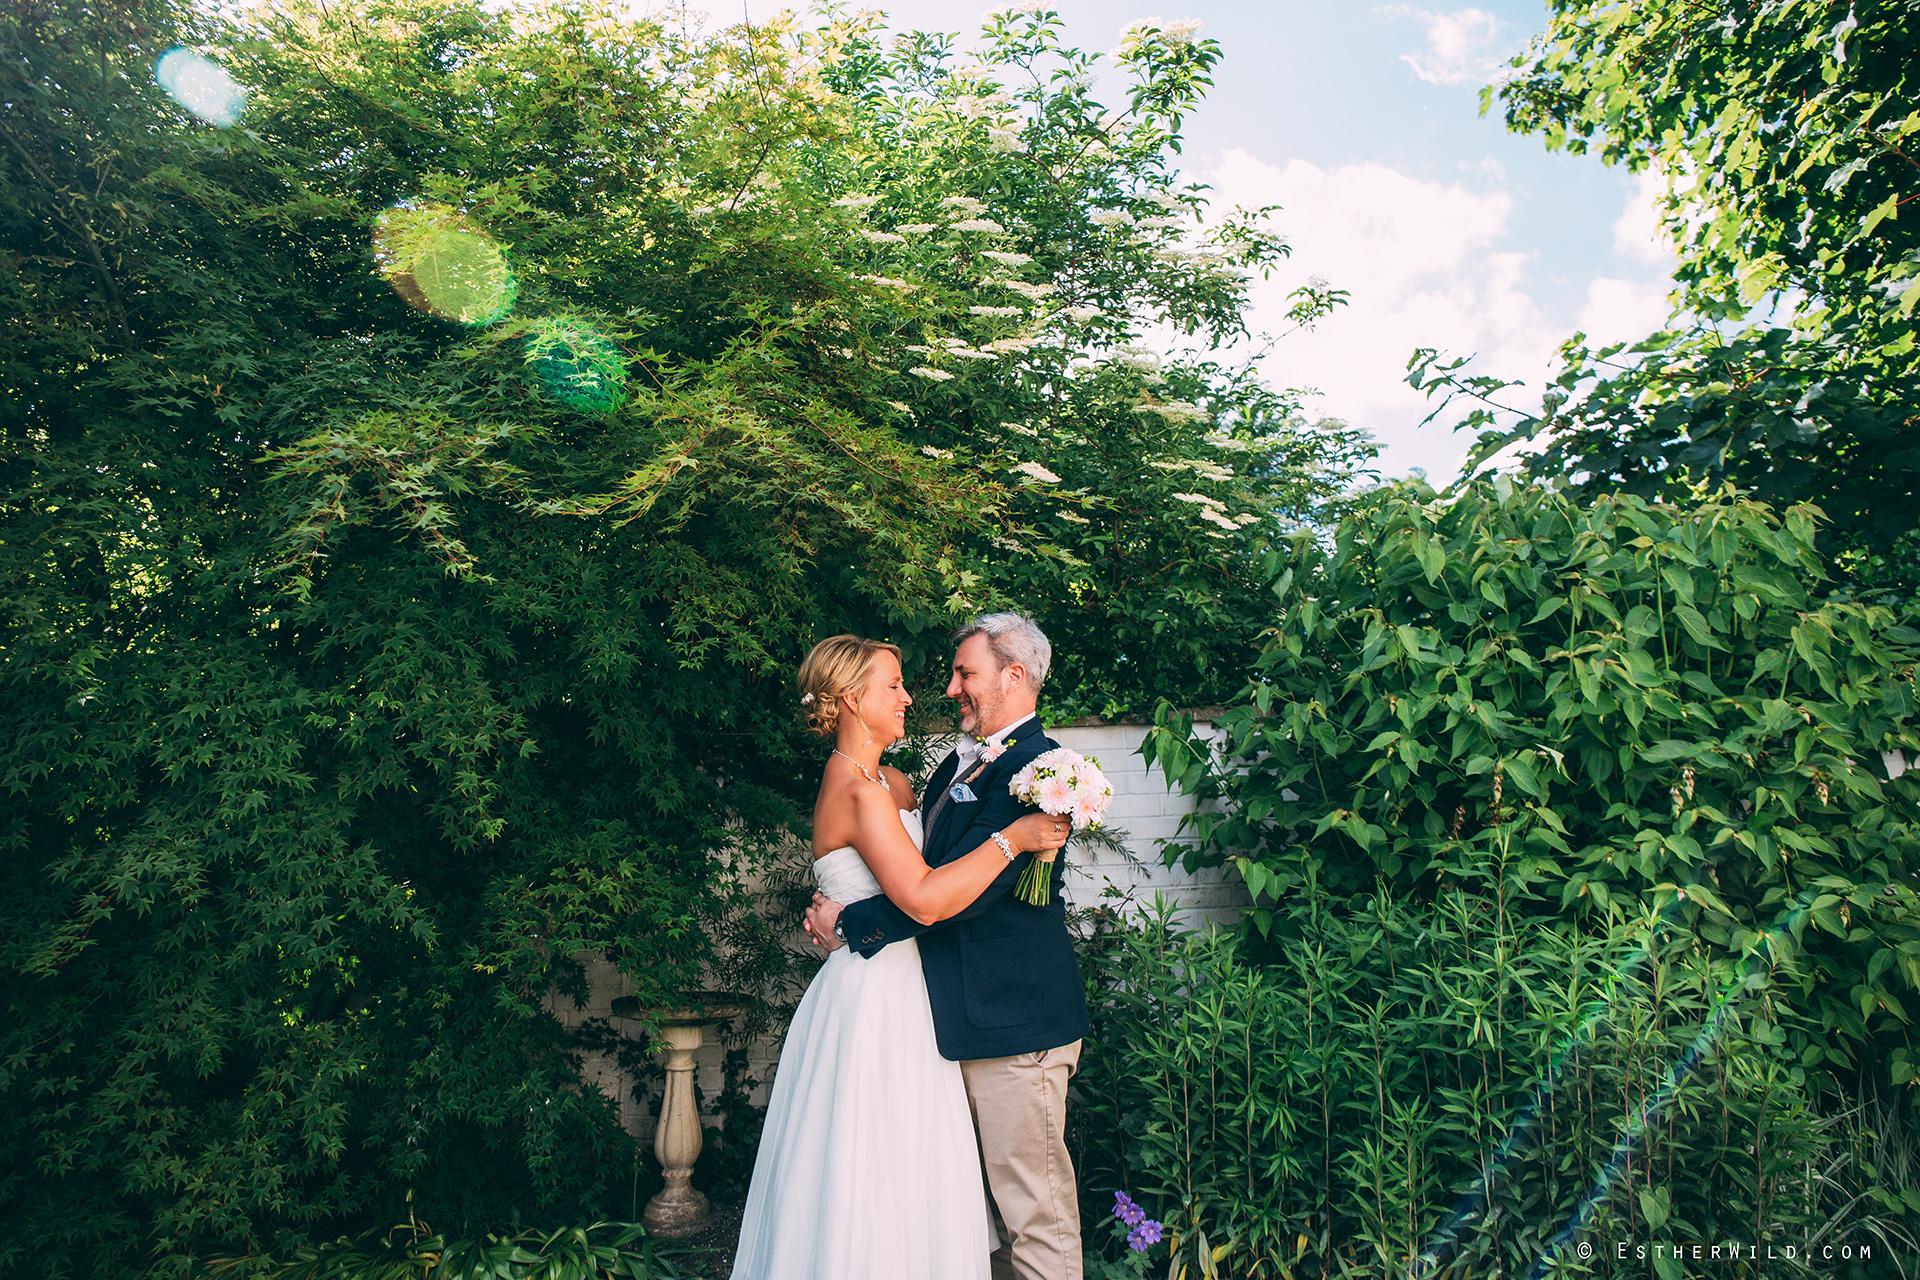 0517_Kings_Lynn_Town_Hall_Stuart_House_Wedding_Photographer_IMG_8695.jpg